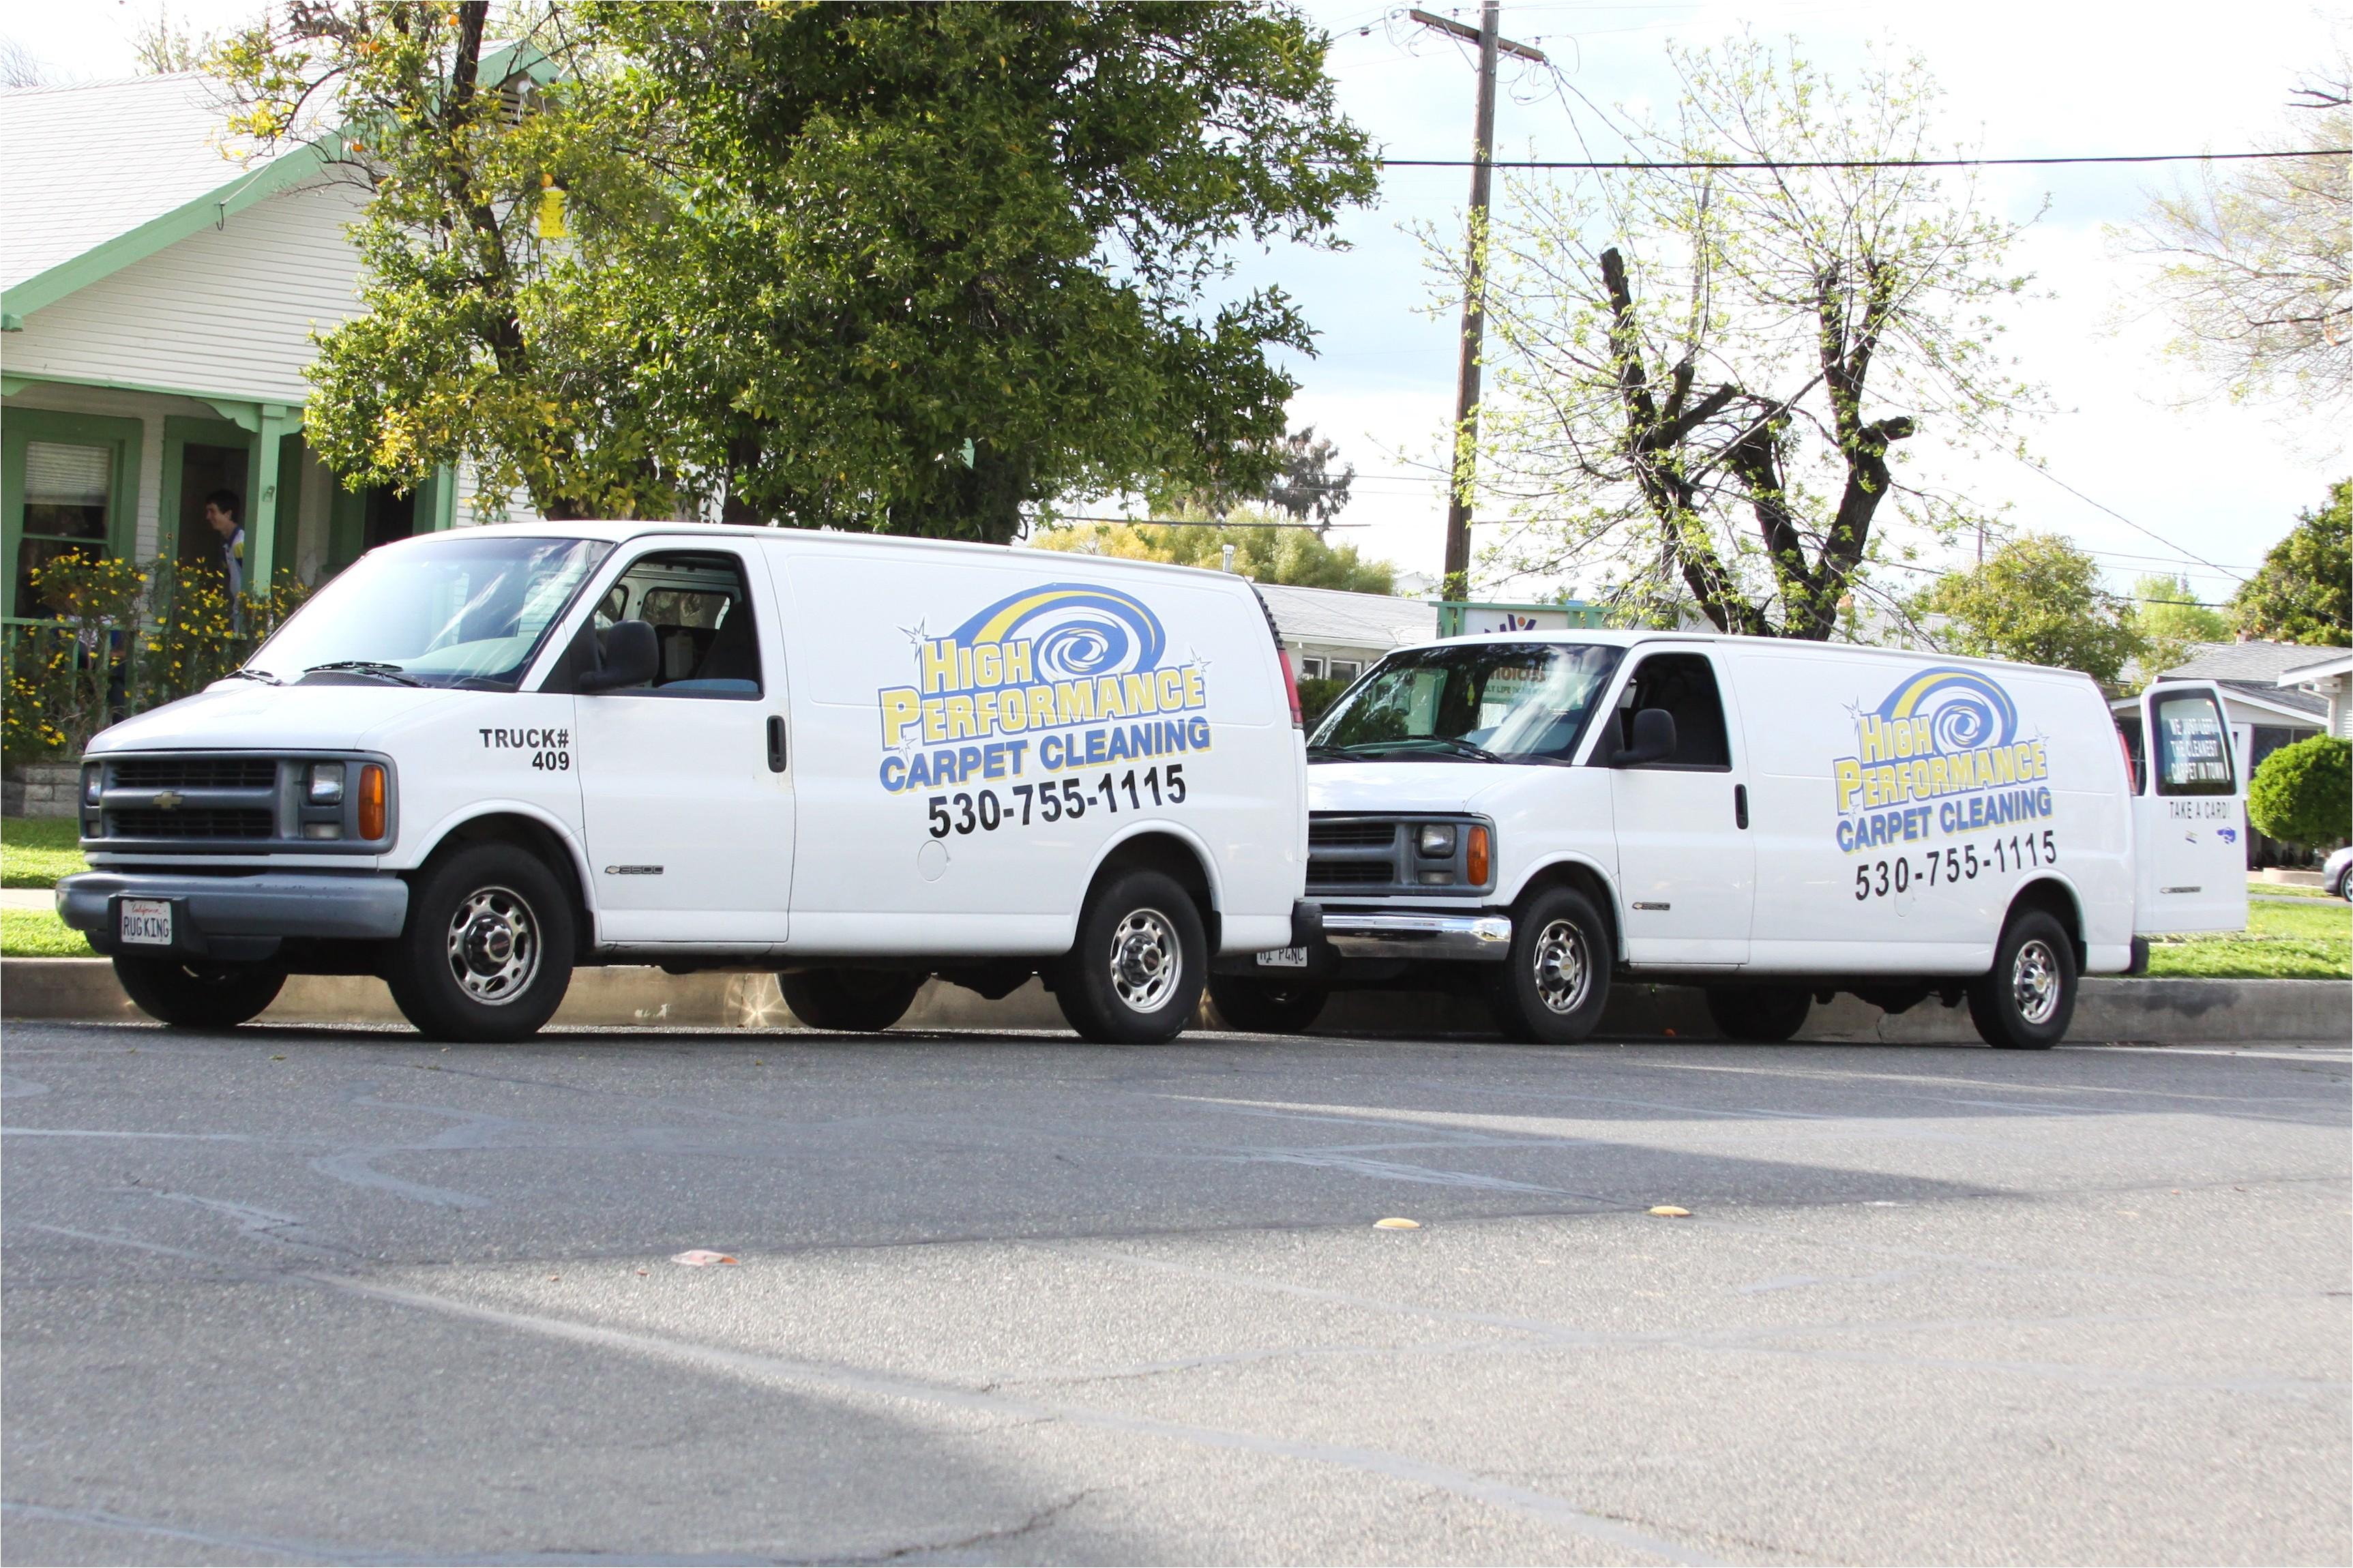 high performance carpet cleaning 811 mesa verde yuba city ca 95993 yp com